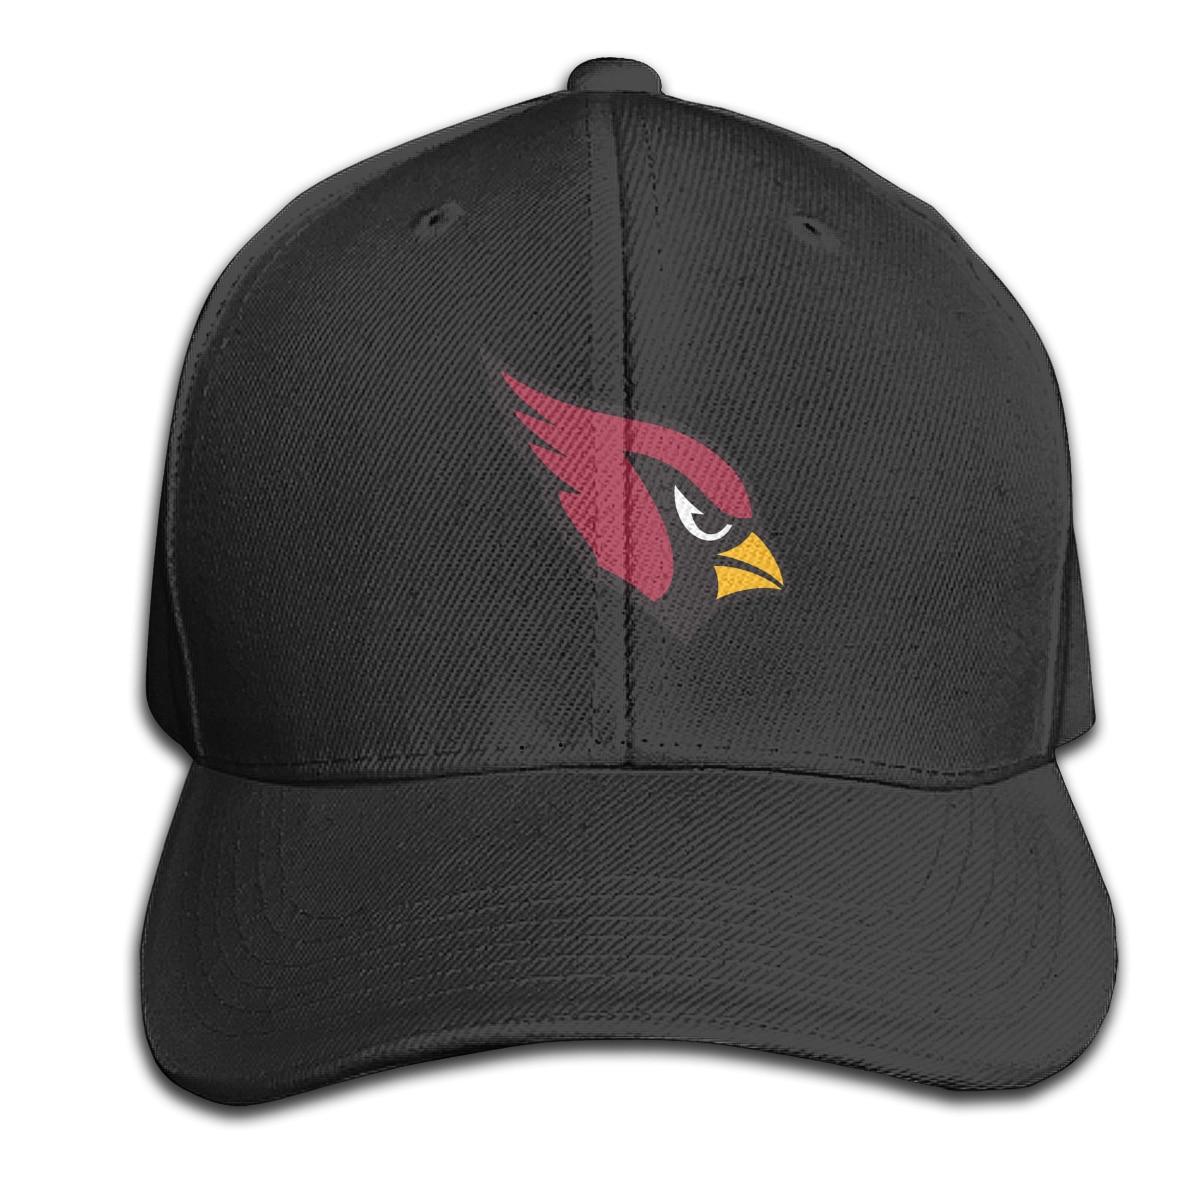 2020 Women Men Cardinals Baseball Cap Snapback Hat Summer Outdoor Adjustable Hip Hop Hats Casquette